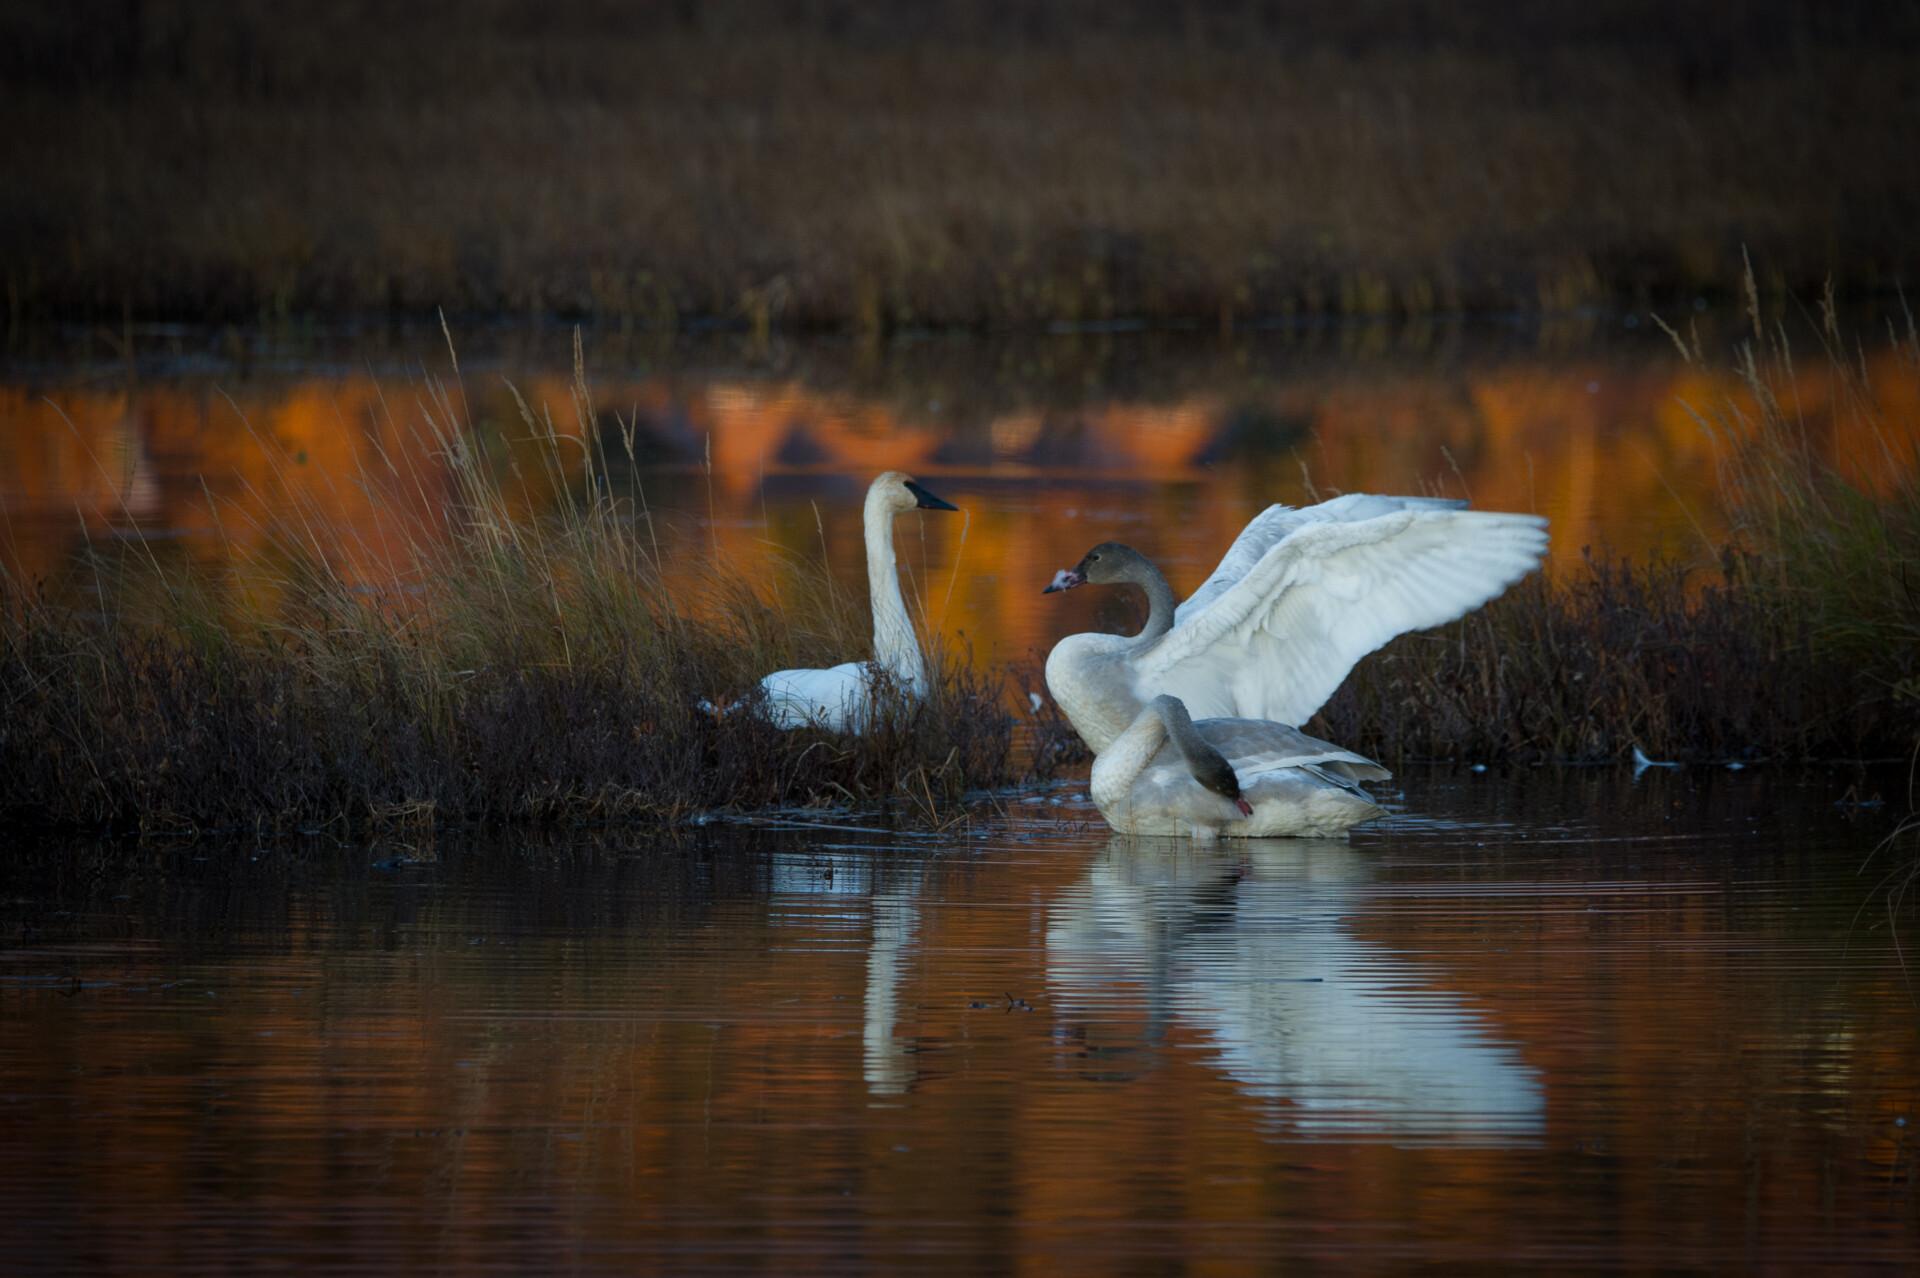 Wildlife & Outdoor Photography